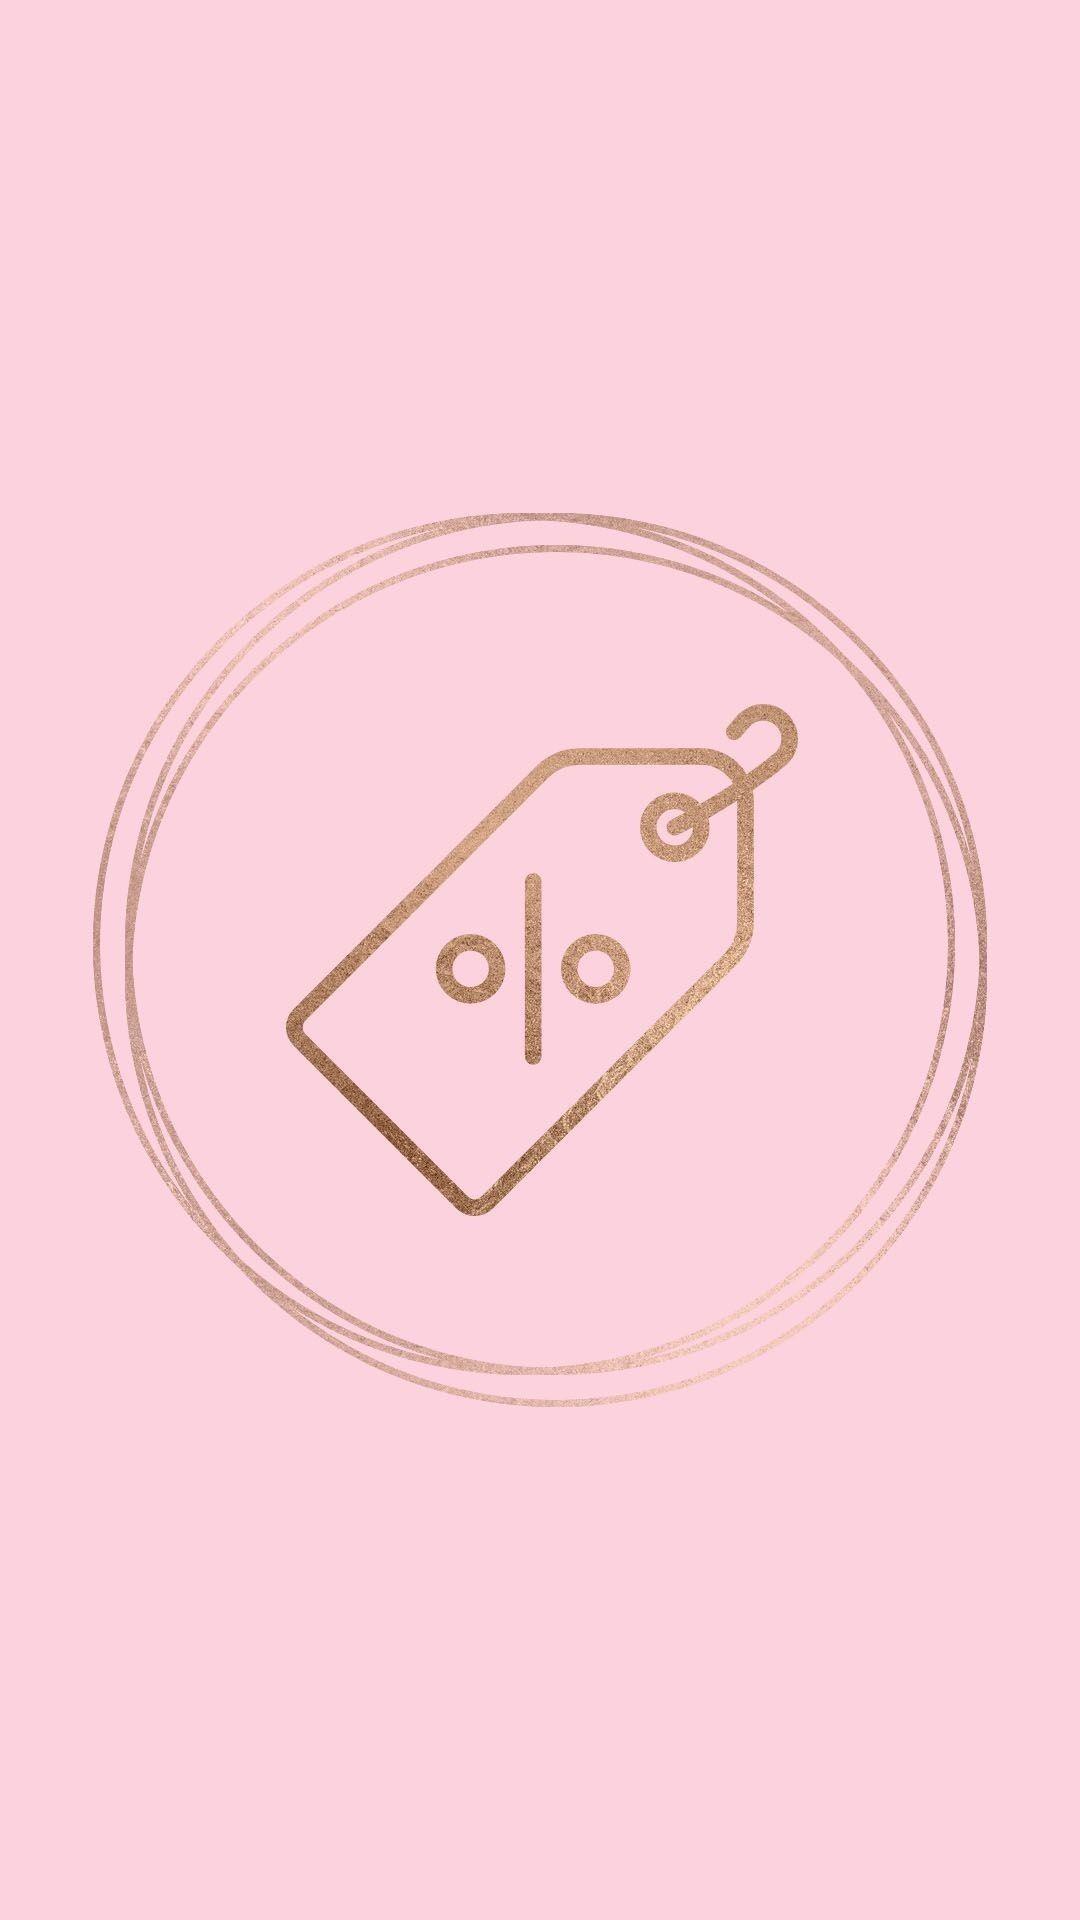 Pin De Laury Duran Em Baptism Label Ideias Instagram Logotipo